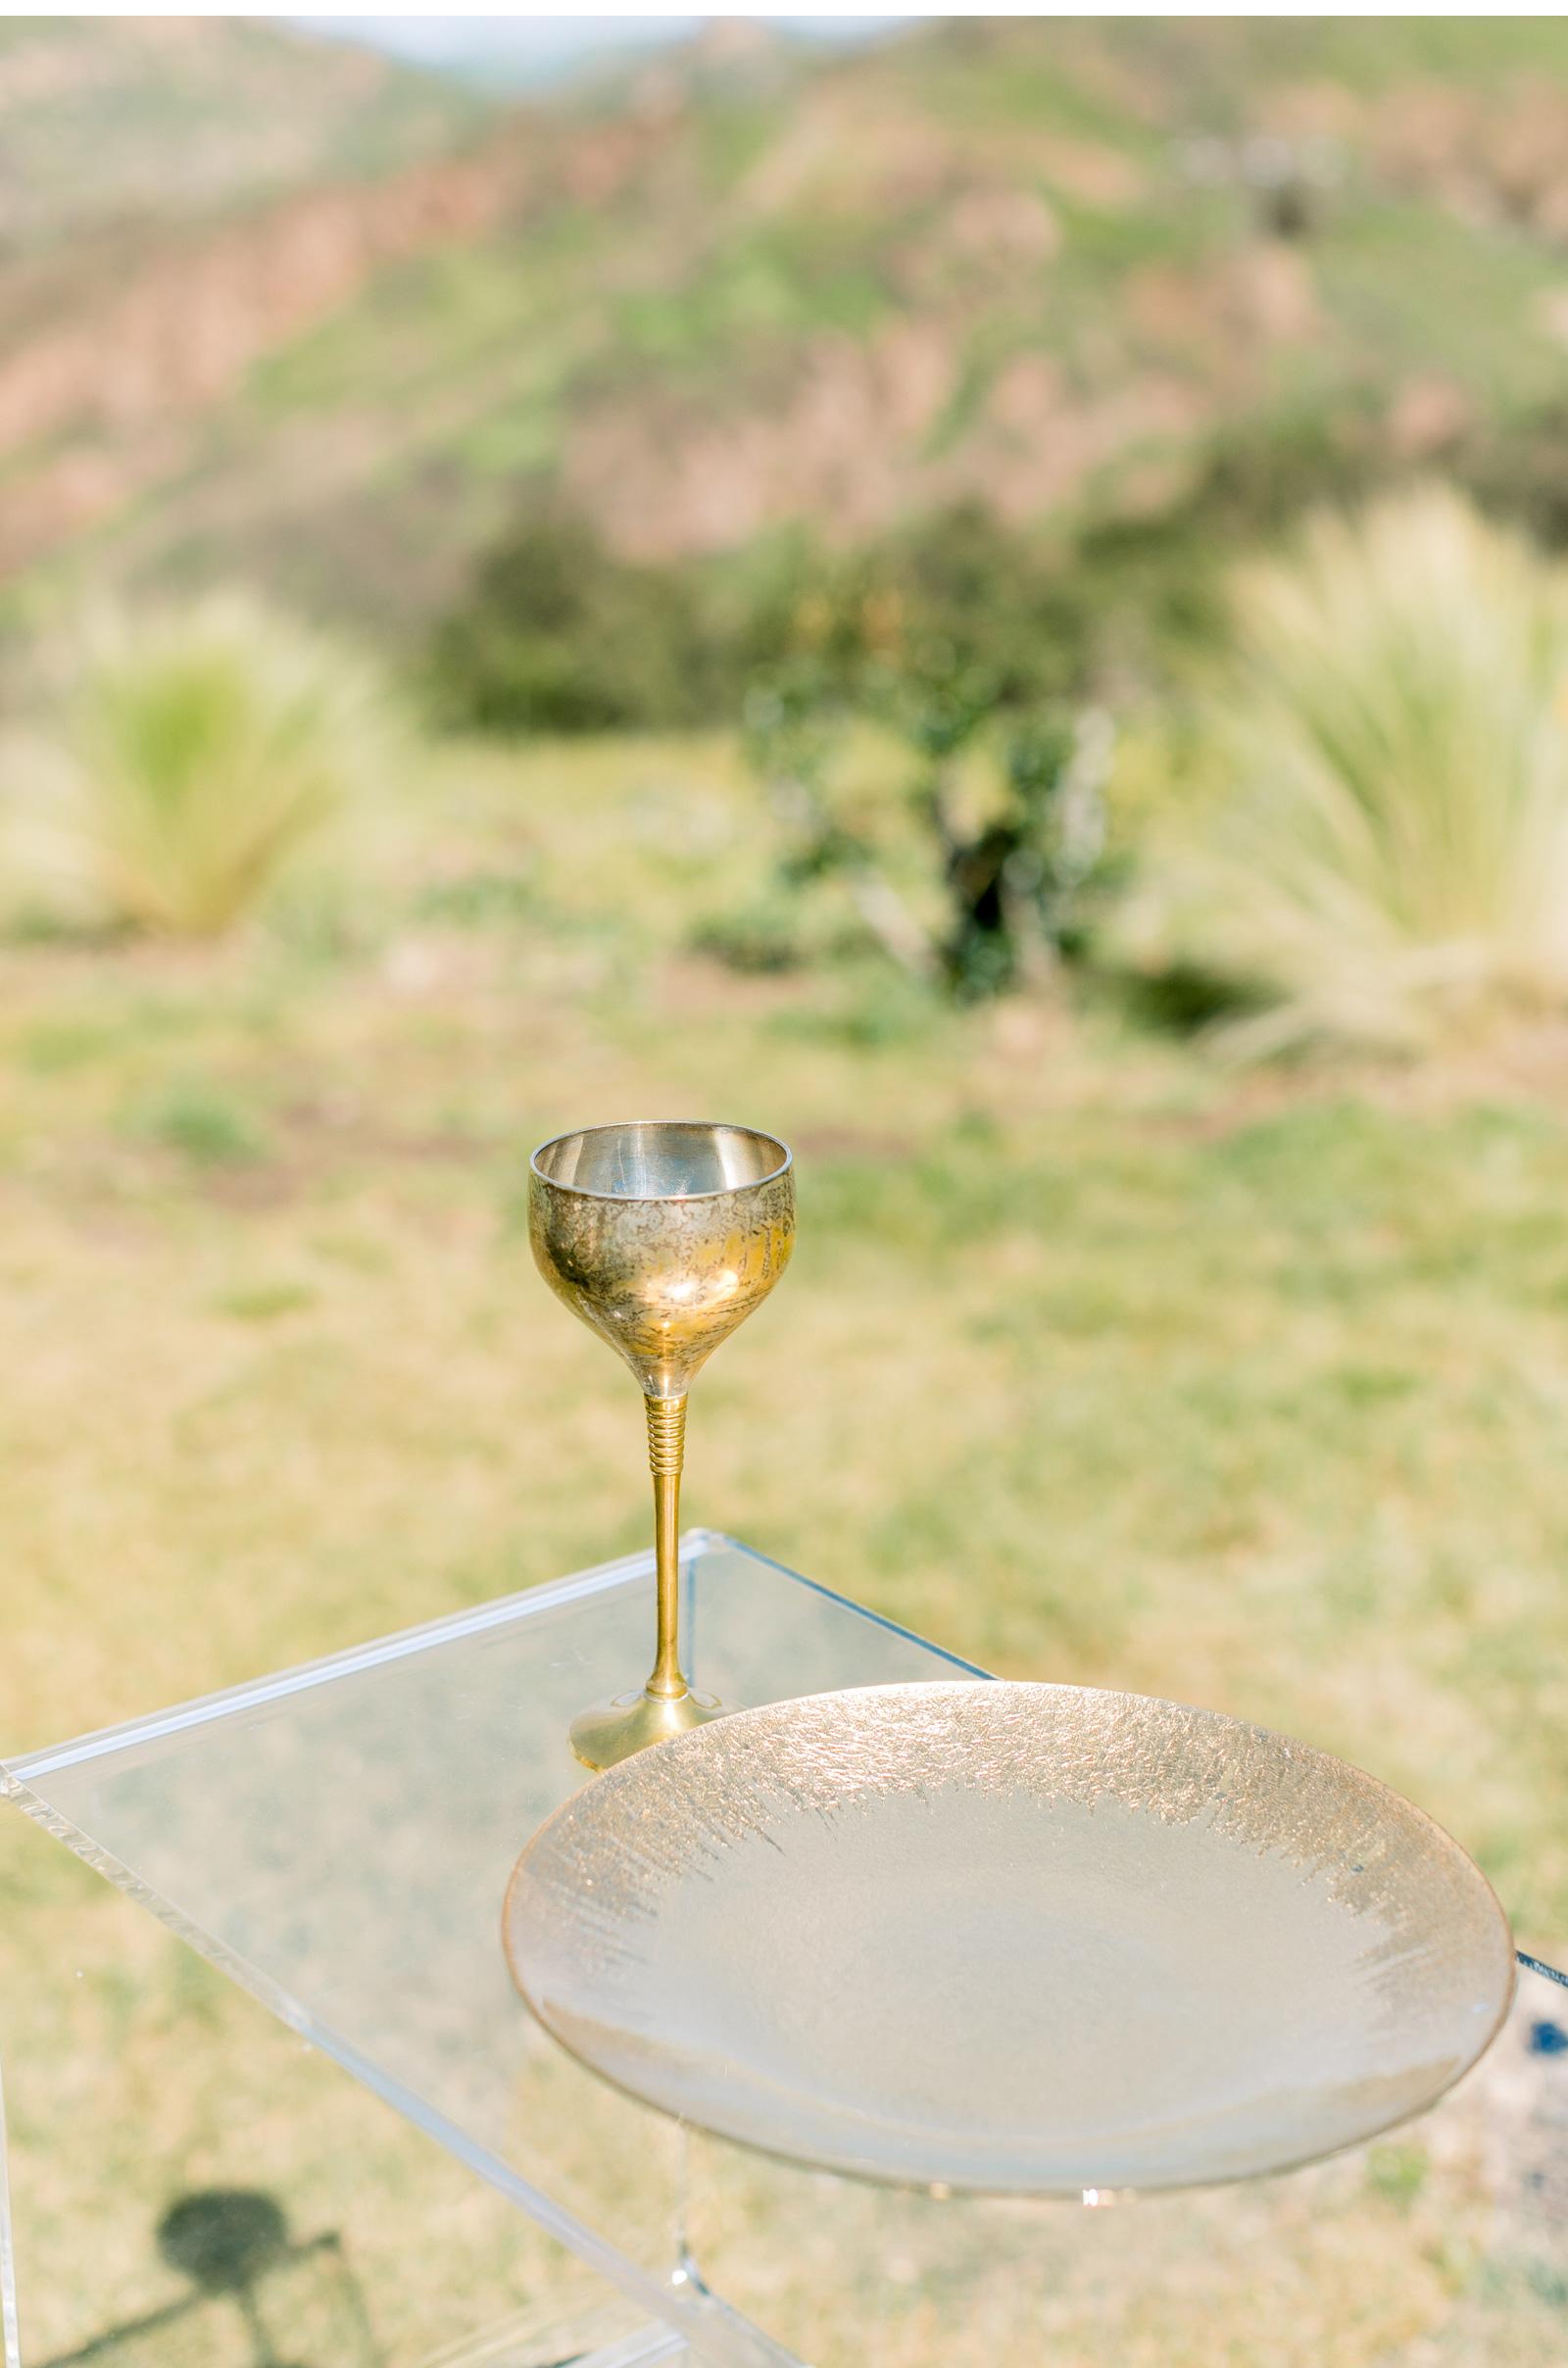 Malibu-Wedding-Venue-Photographer-Southern-California-Fine-Art-Wedding-Photo-Style-Me-Pretty-Natalie-Schutt-Photography_06.jpg